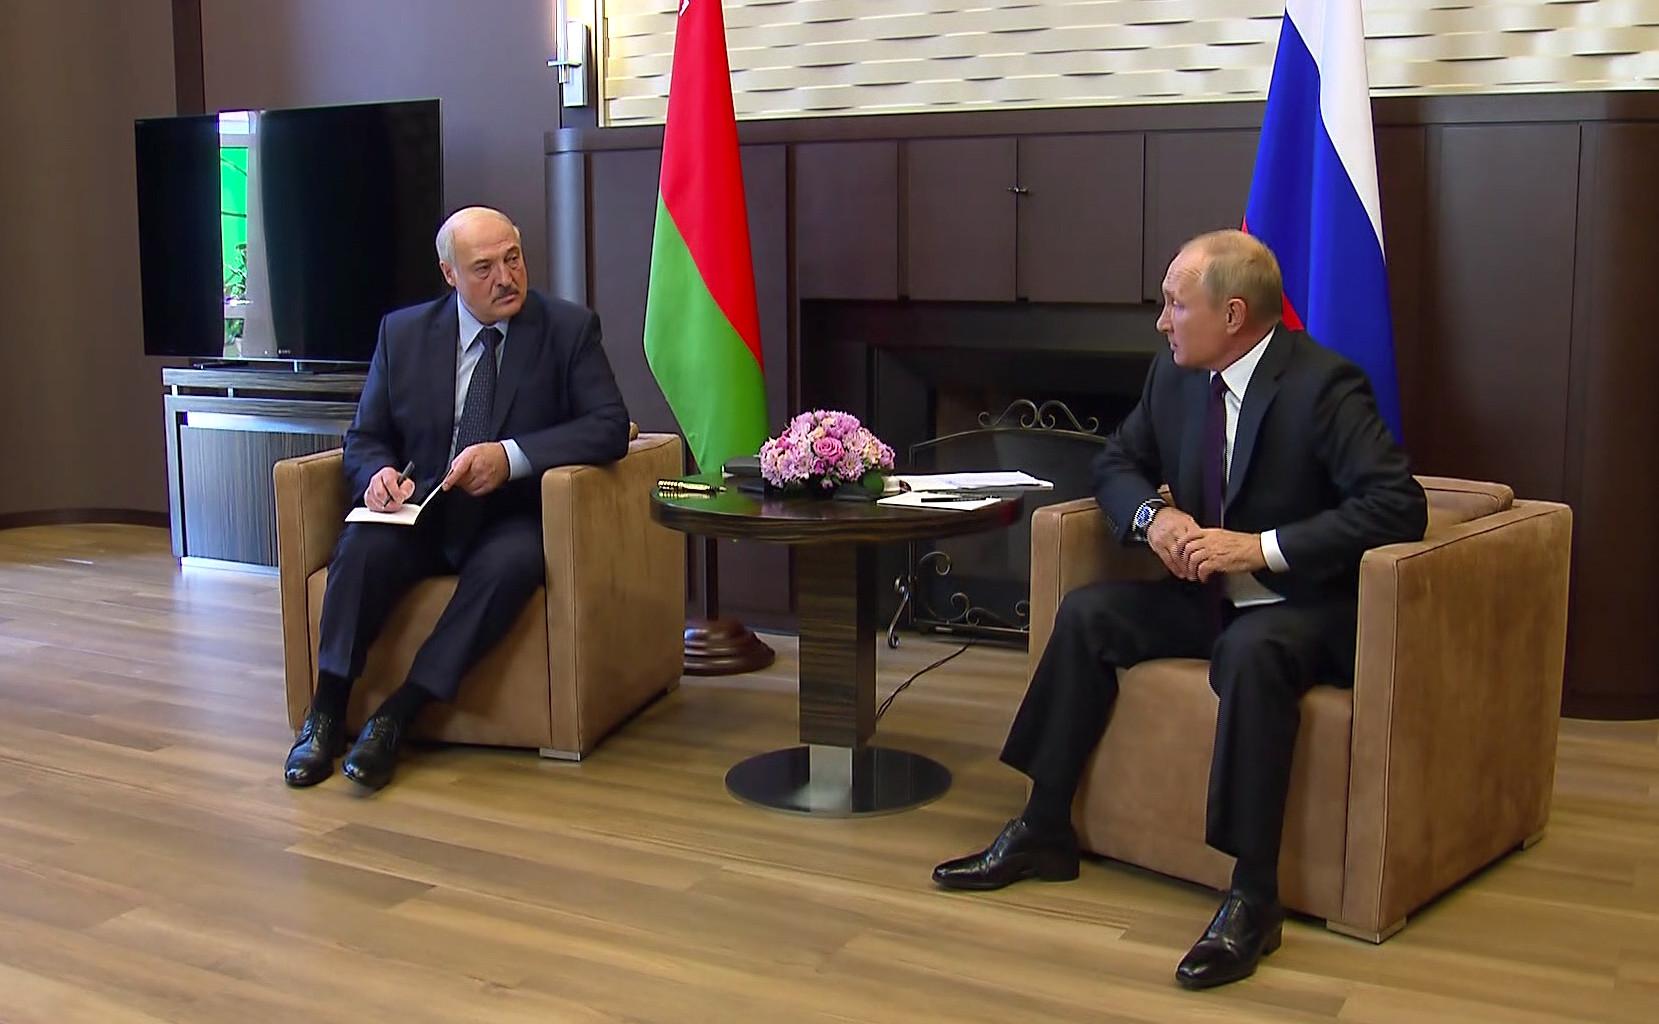 Деньги вместо бойцов пообещал Путин Лукашенко